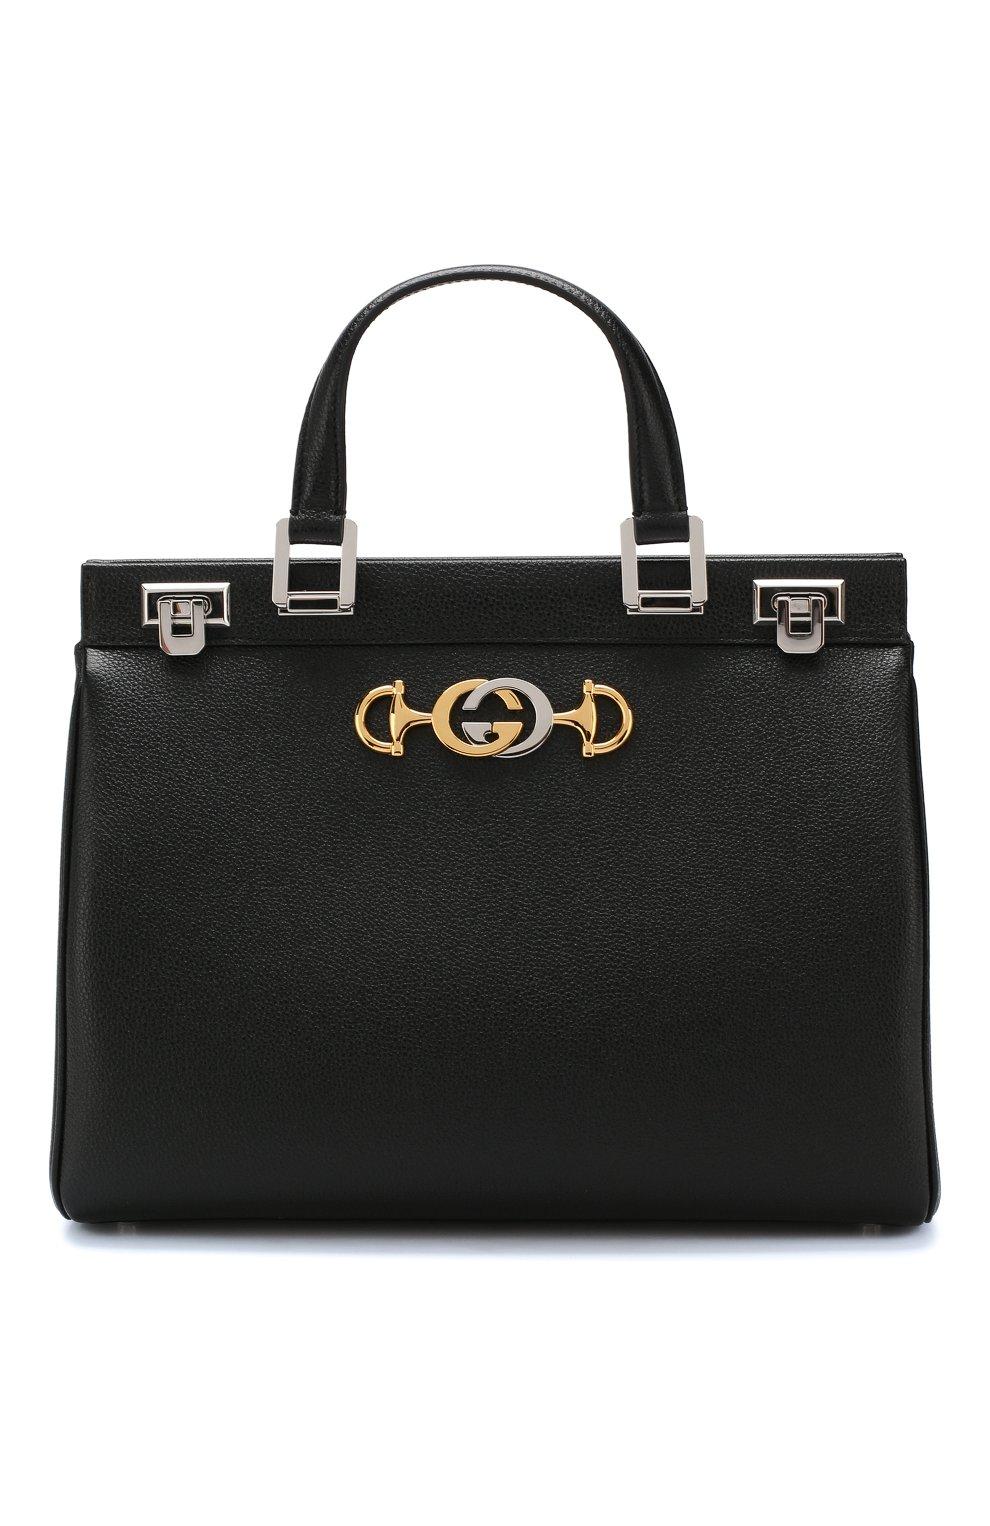 5fa414b1d360 Сумки Gucci по цене от 49 950 руб. купить в интернет-магазине ЦУМ